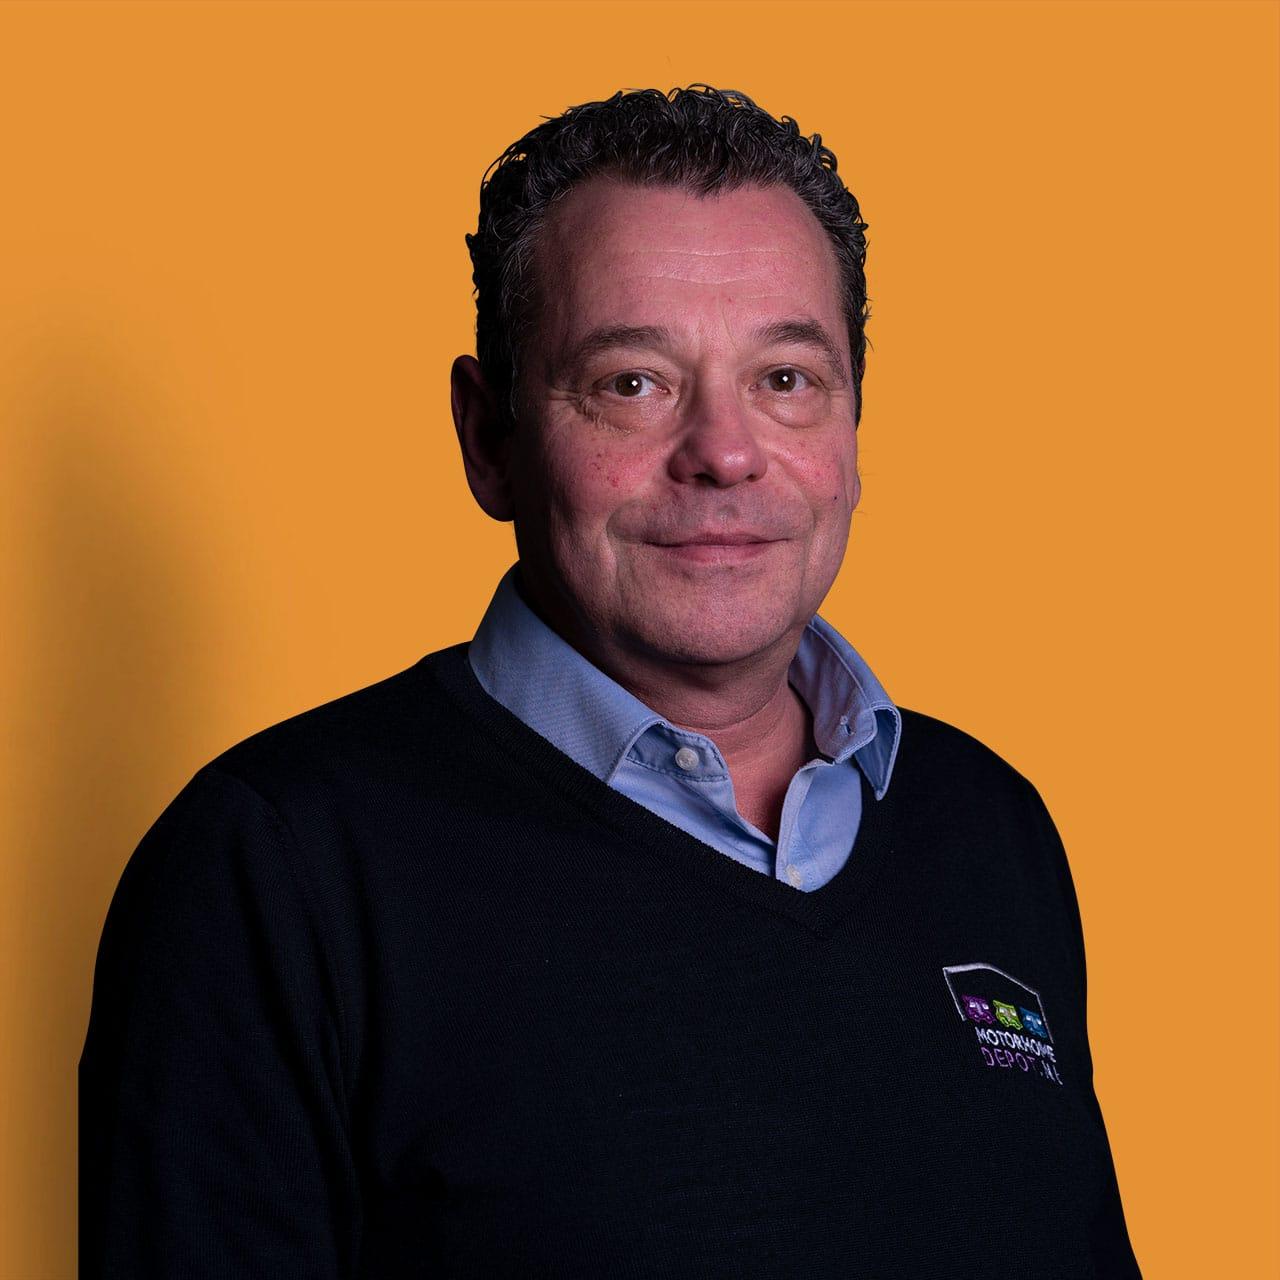 Jaap Molenberg